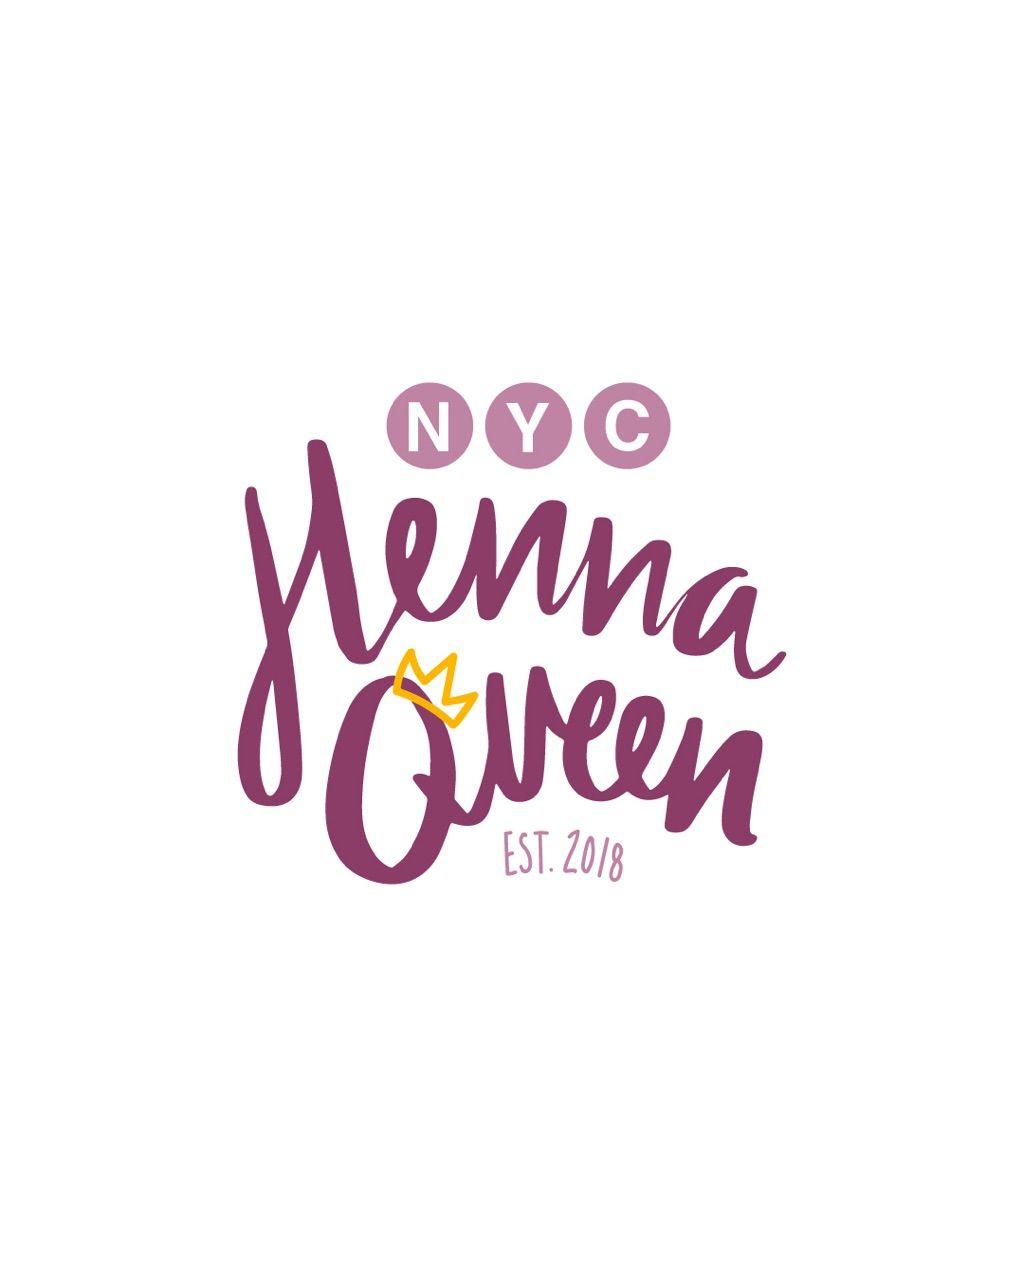 NYC Henna Queen